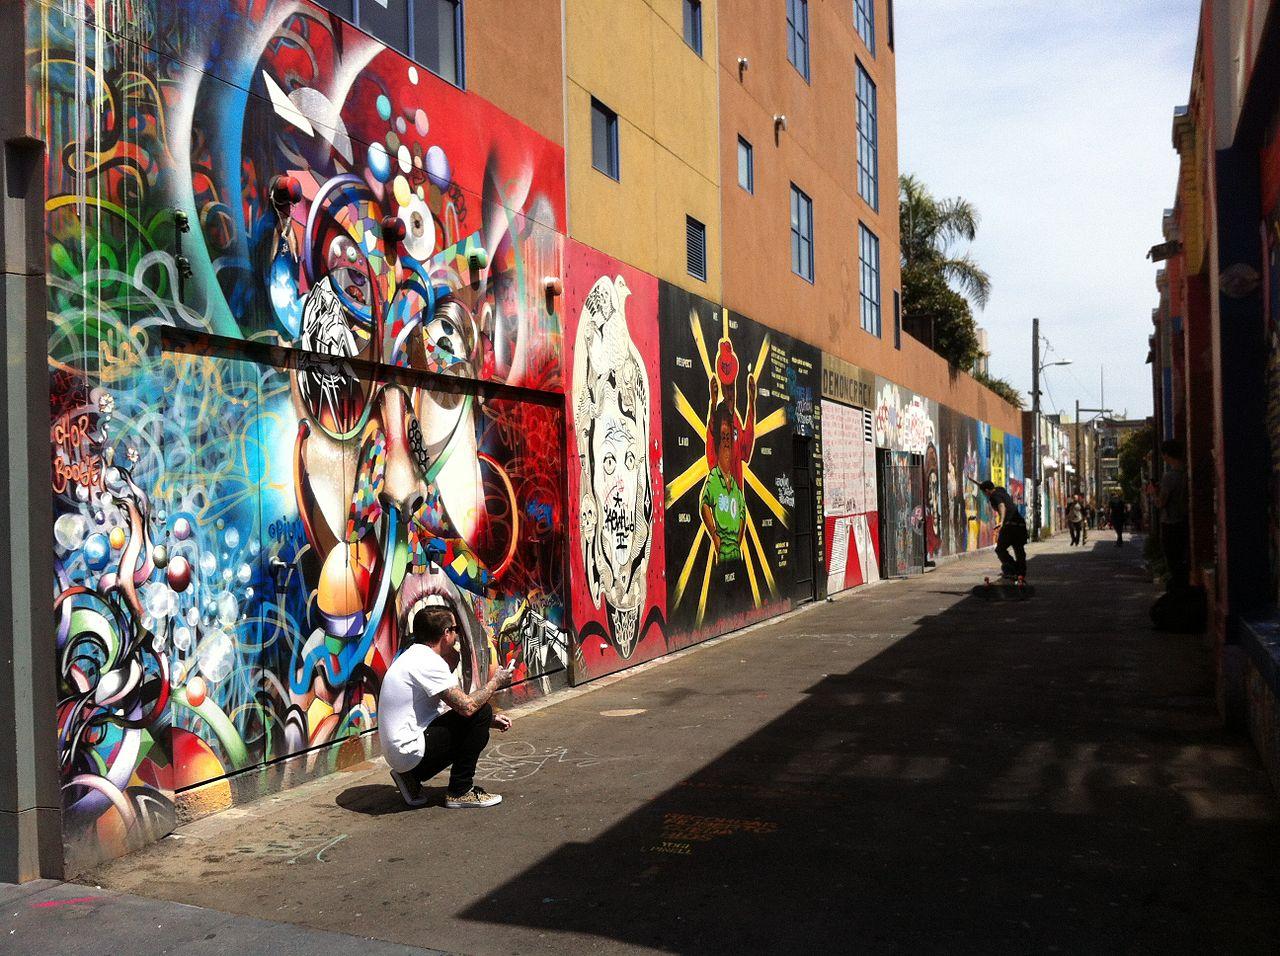 File:Graffiti alley in San francisco 2013-04-13 13-18.jpg ...